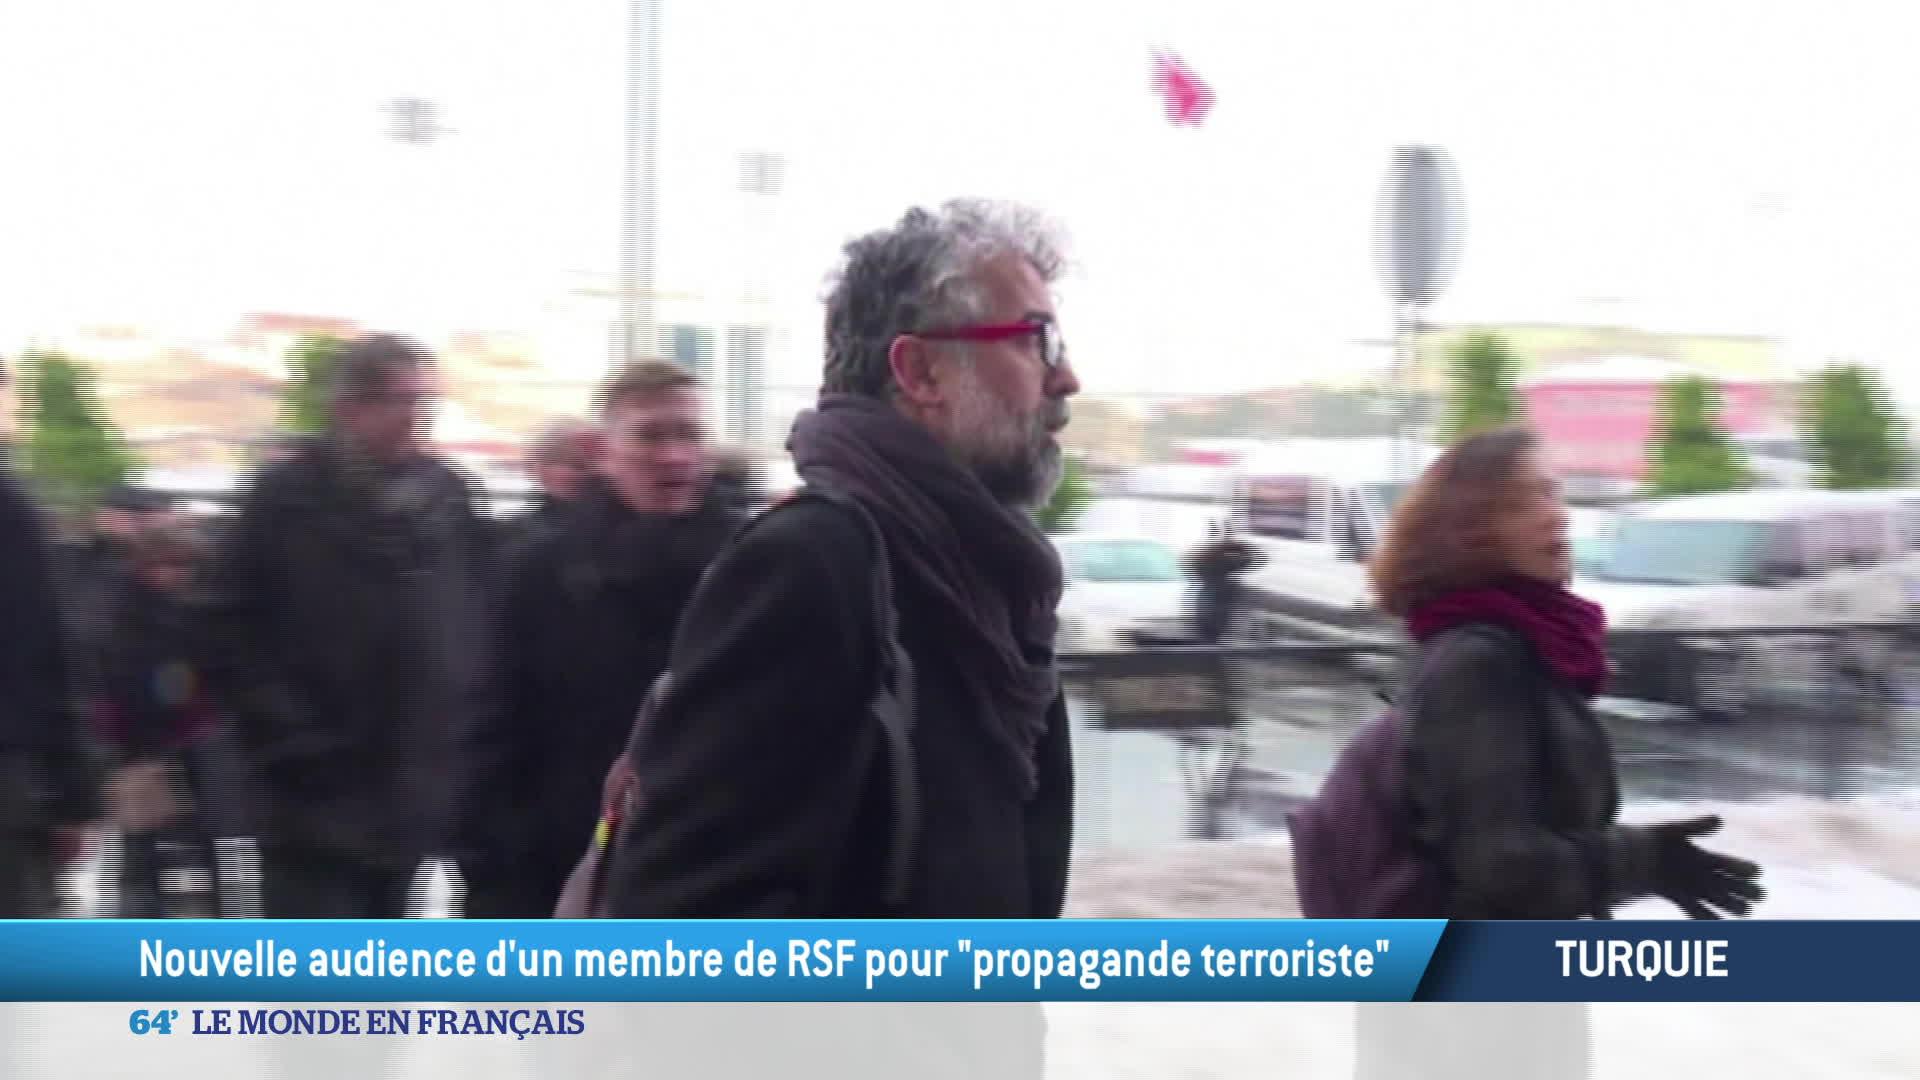 Le procès de Erol Önderoglu en Turquie